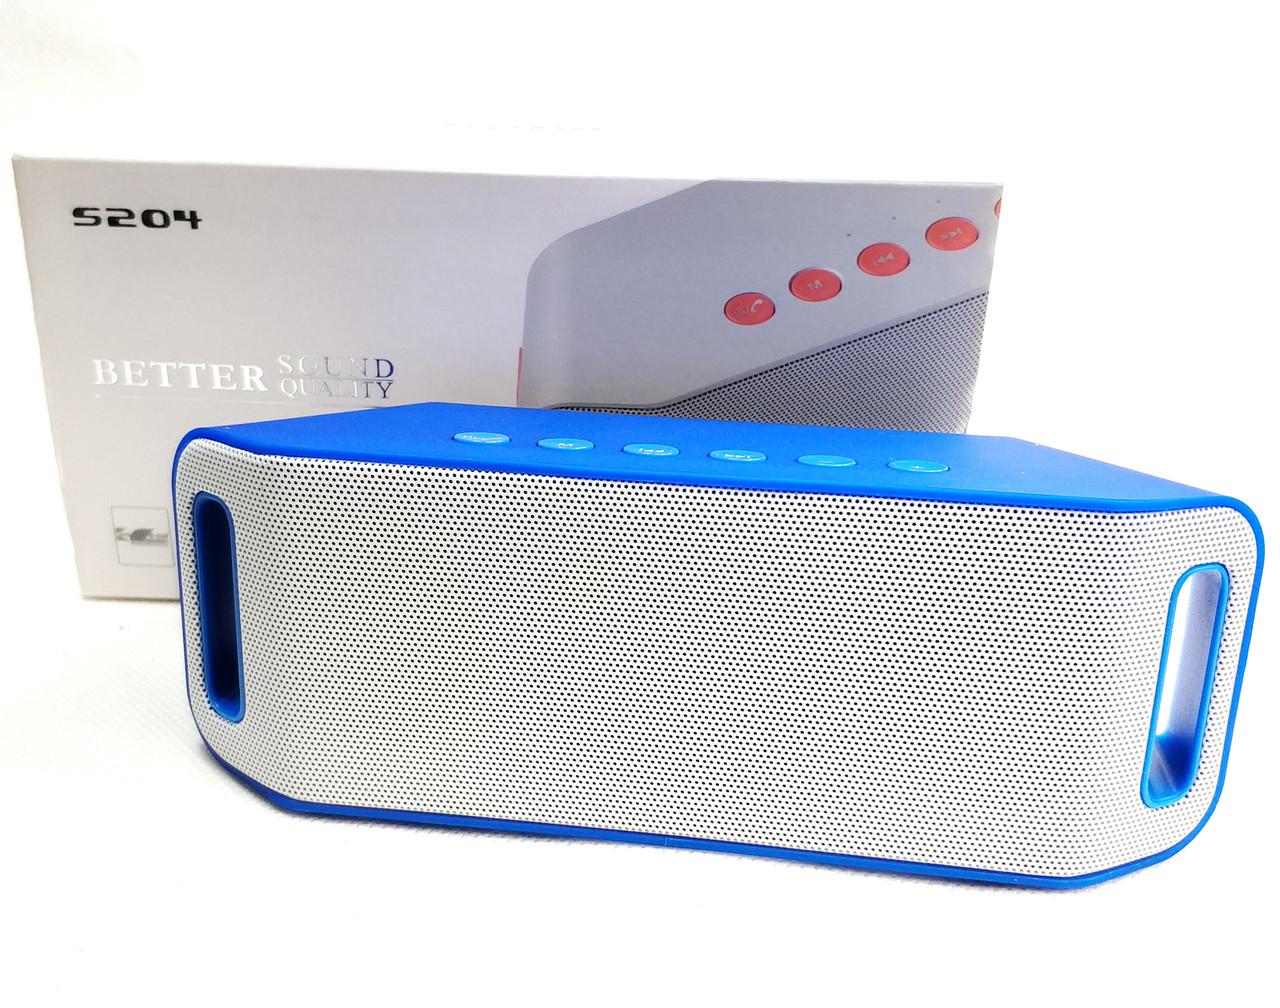 Портативная колонка bluetooth блютуз акустика для телефона мини с флешкой повербанк радио FM синяя S204